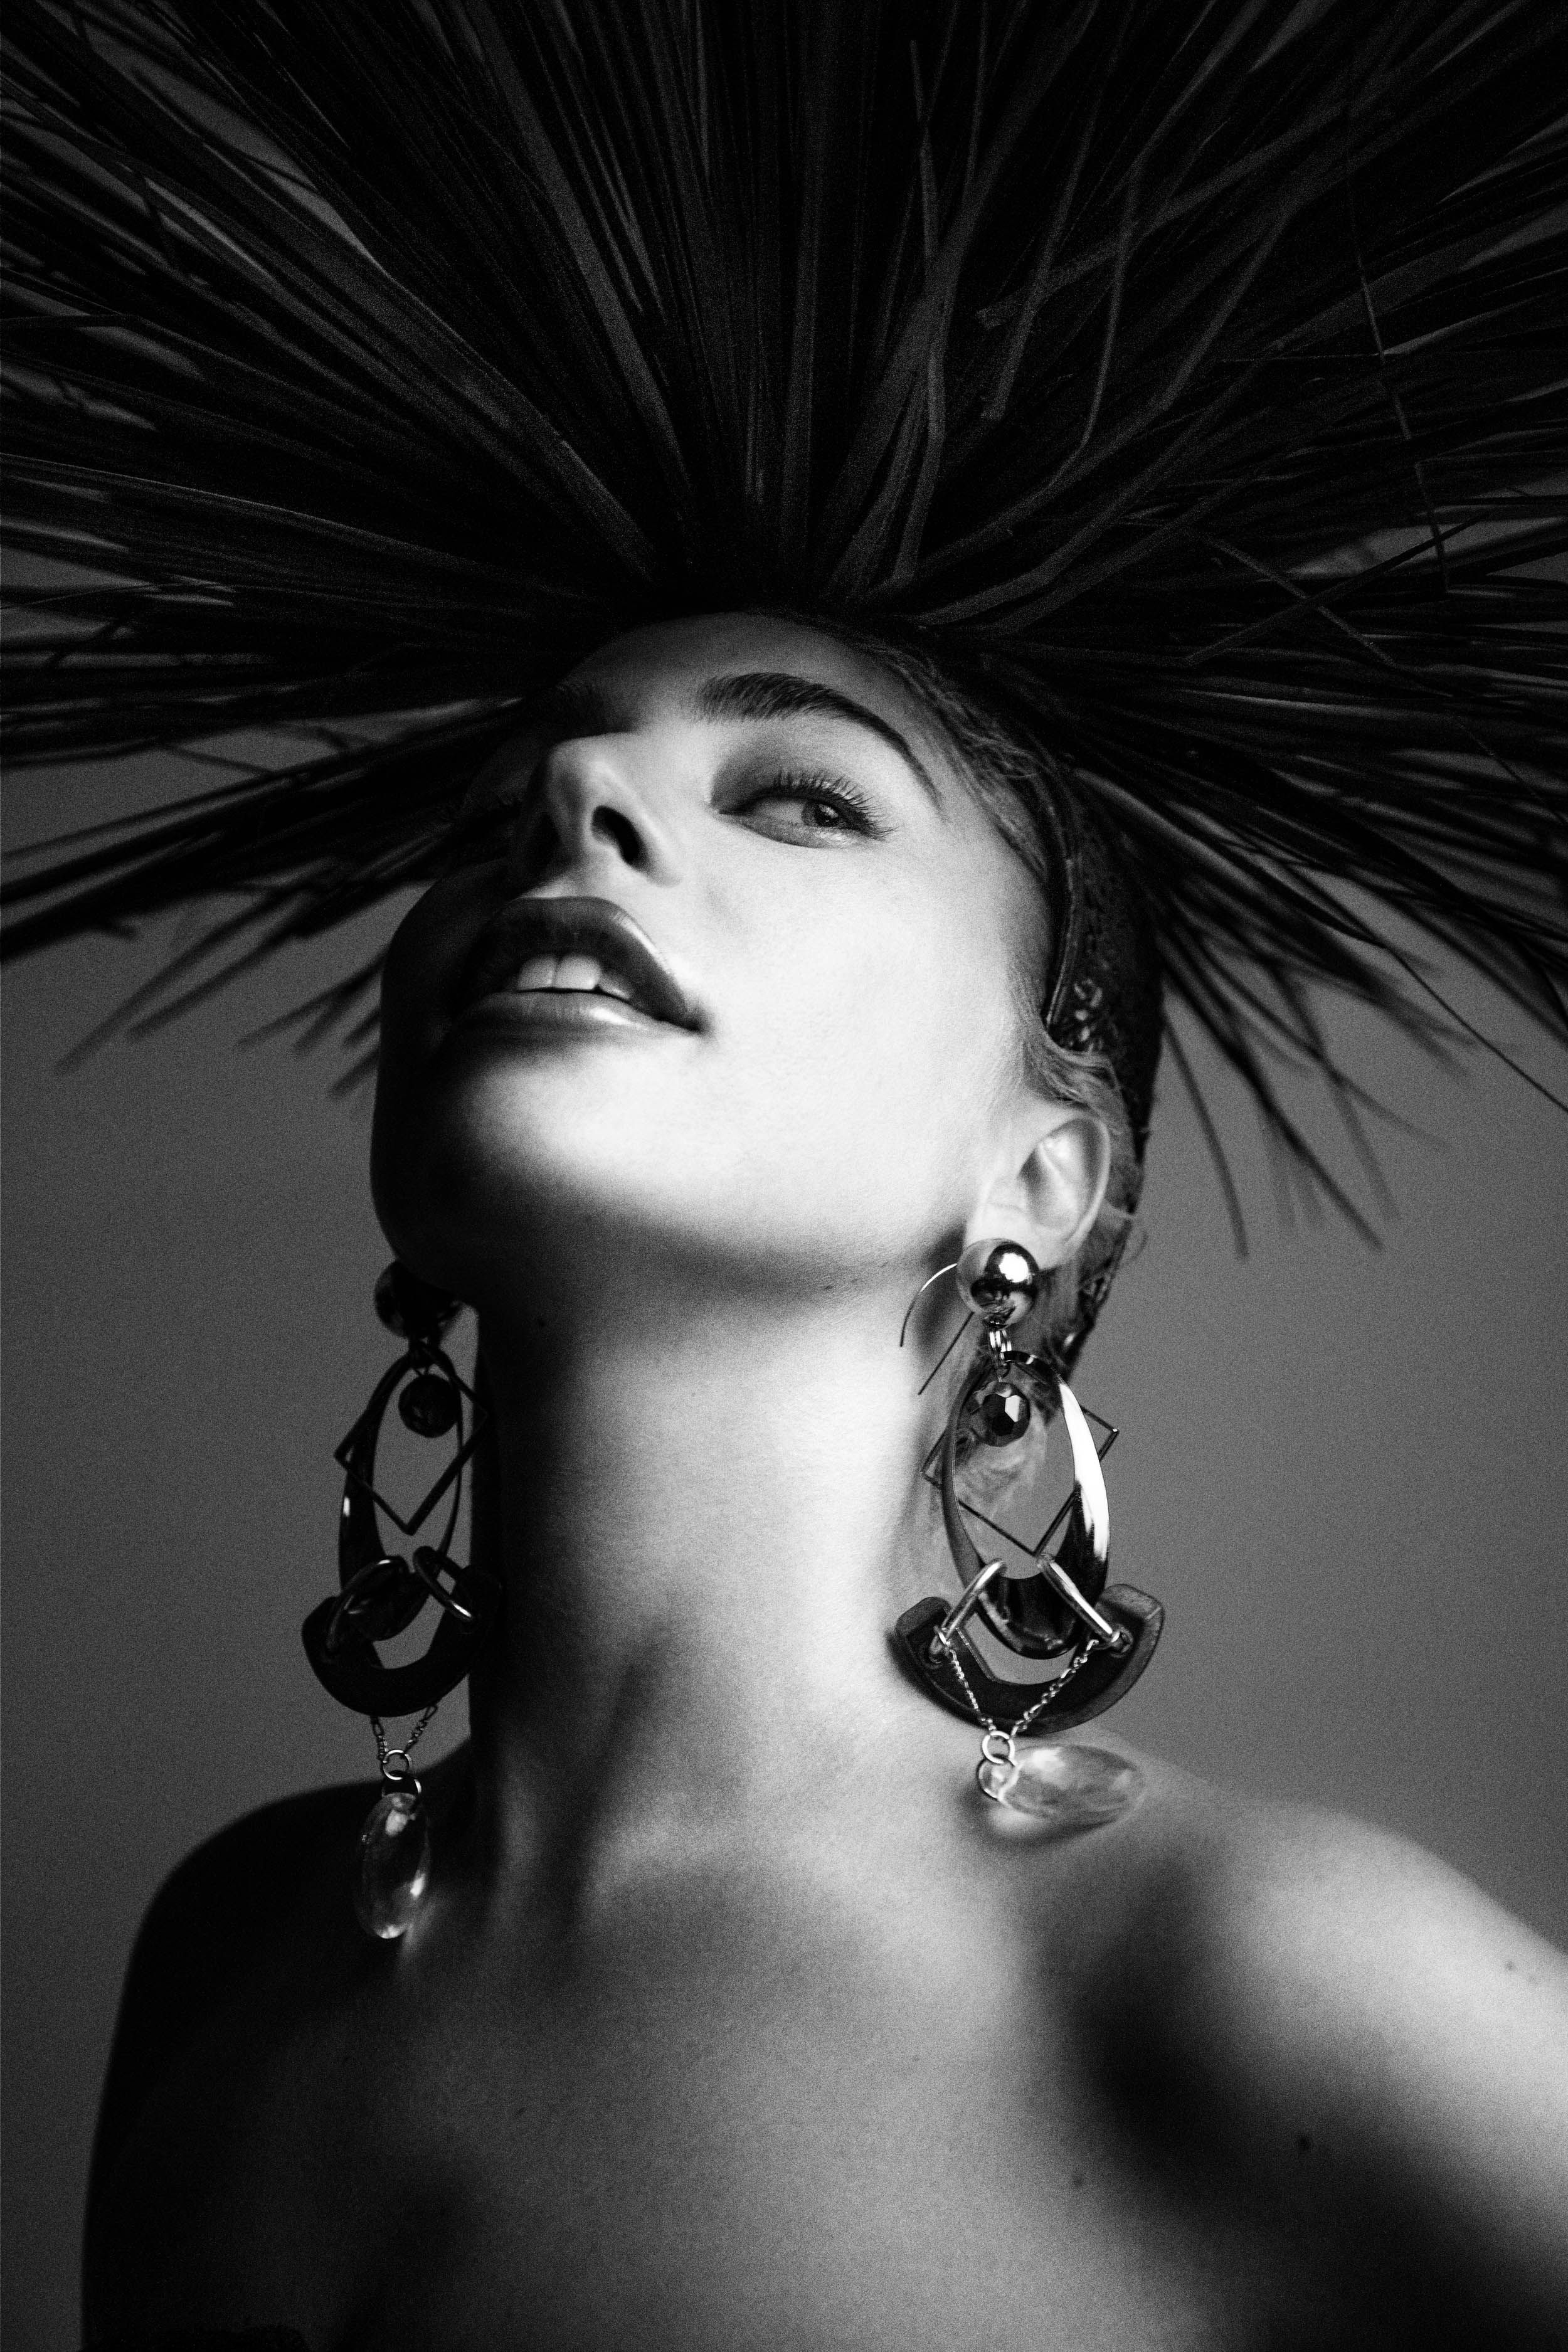 Las Vegas Residency Artists In 2020 Lady Gaga Photoshoot Lady